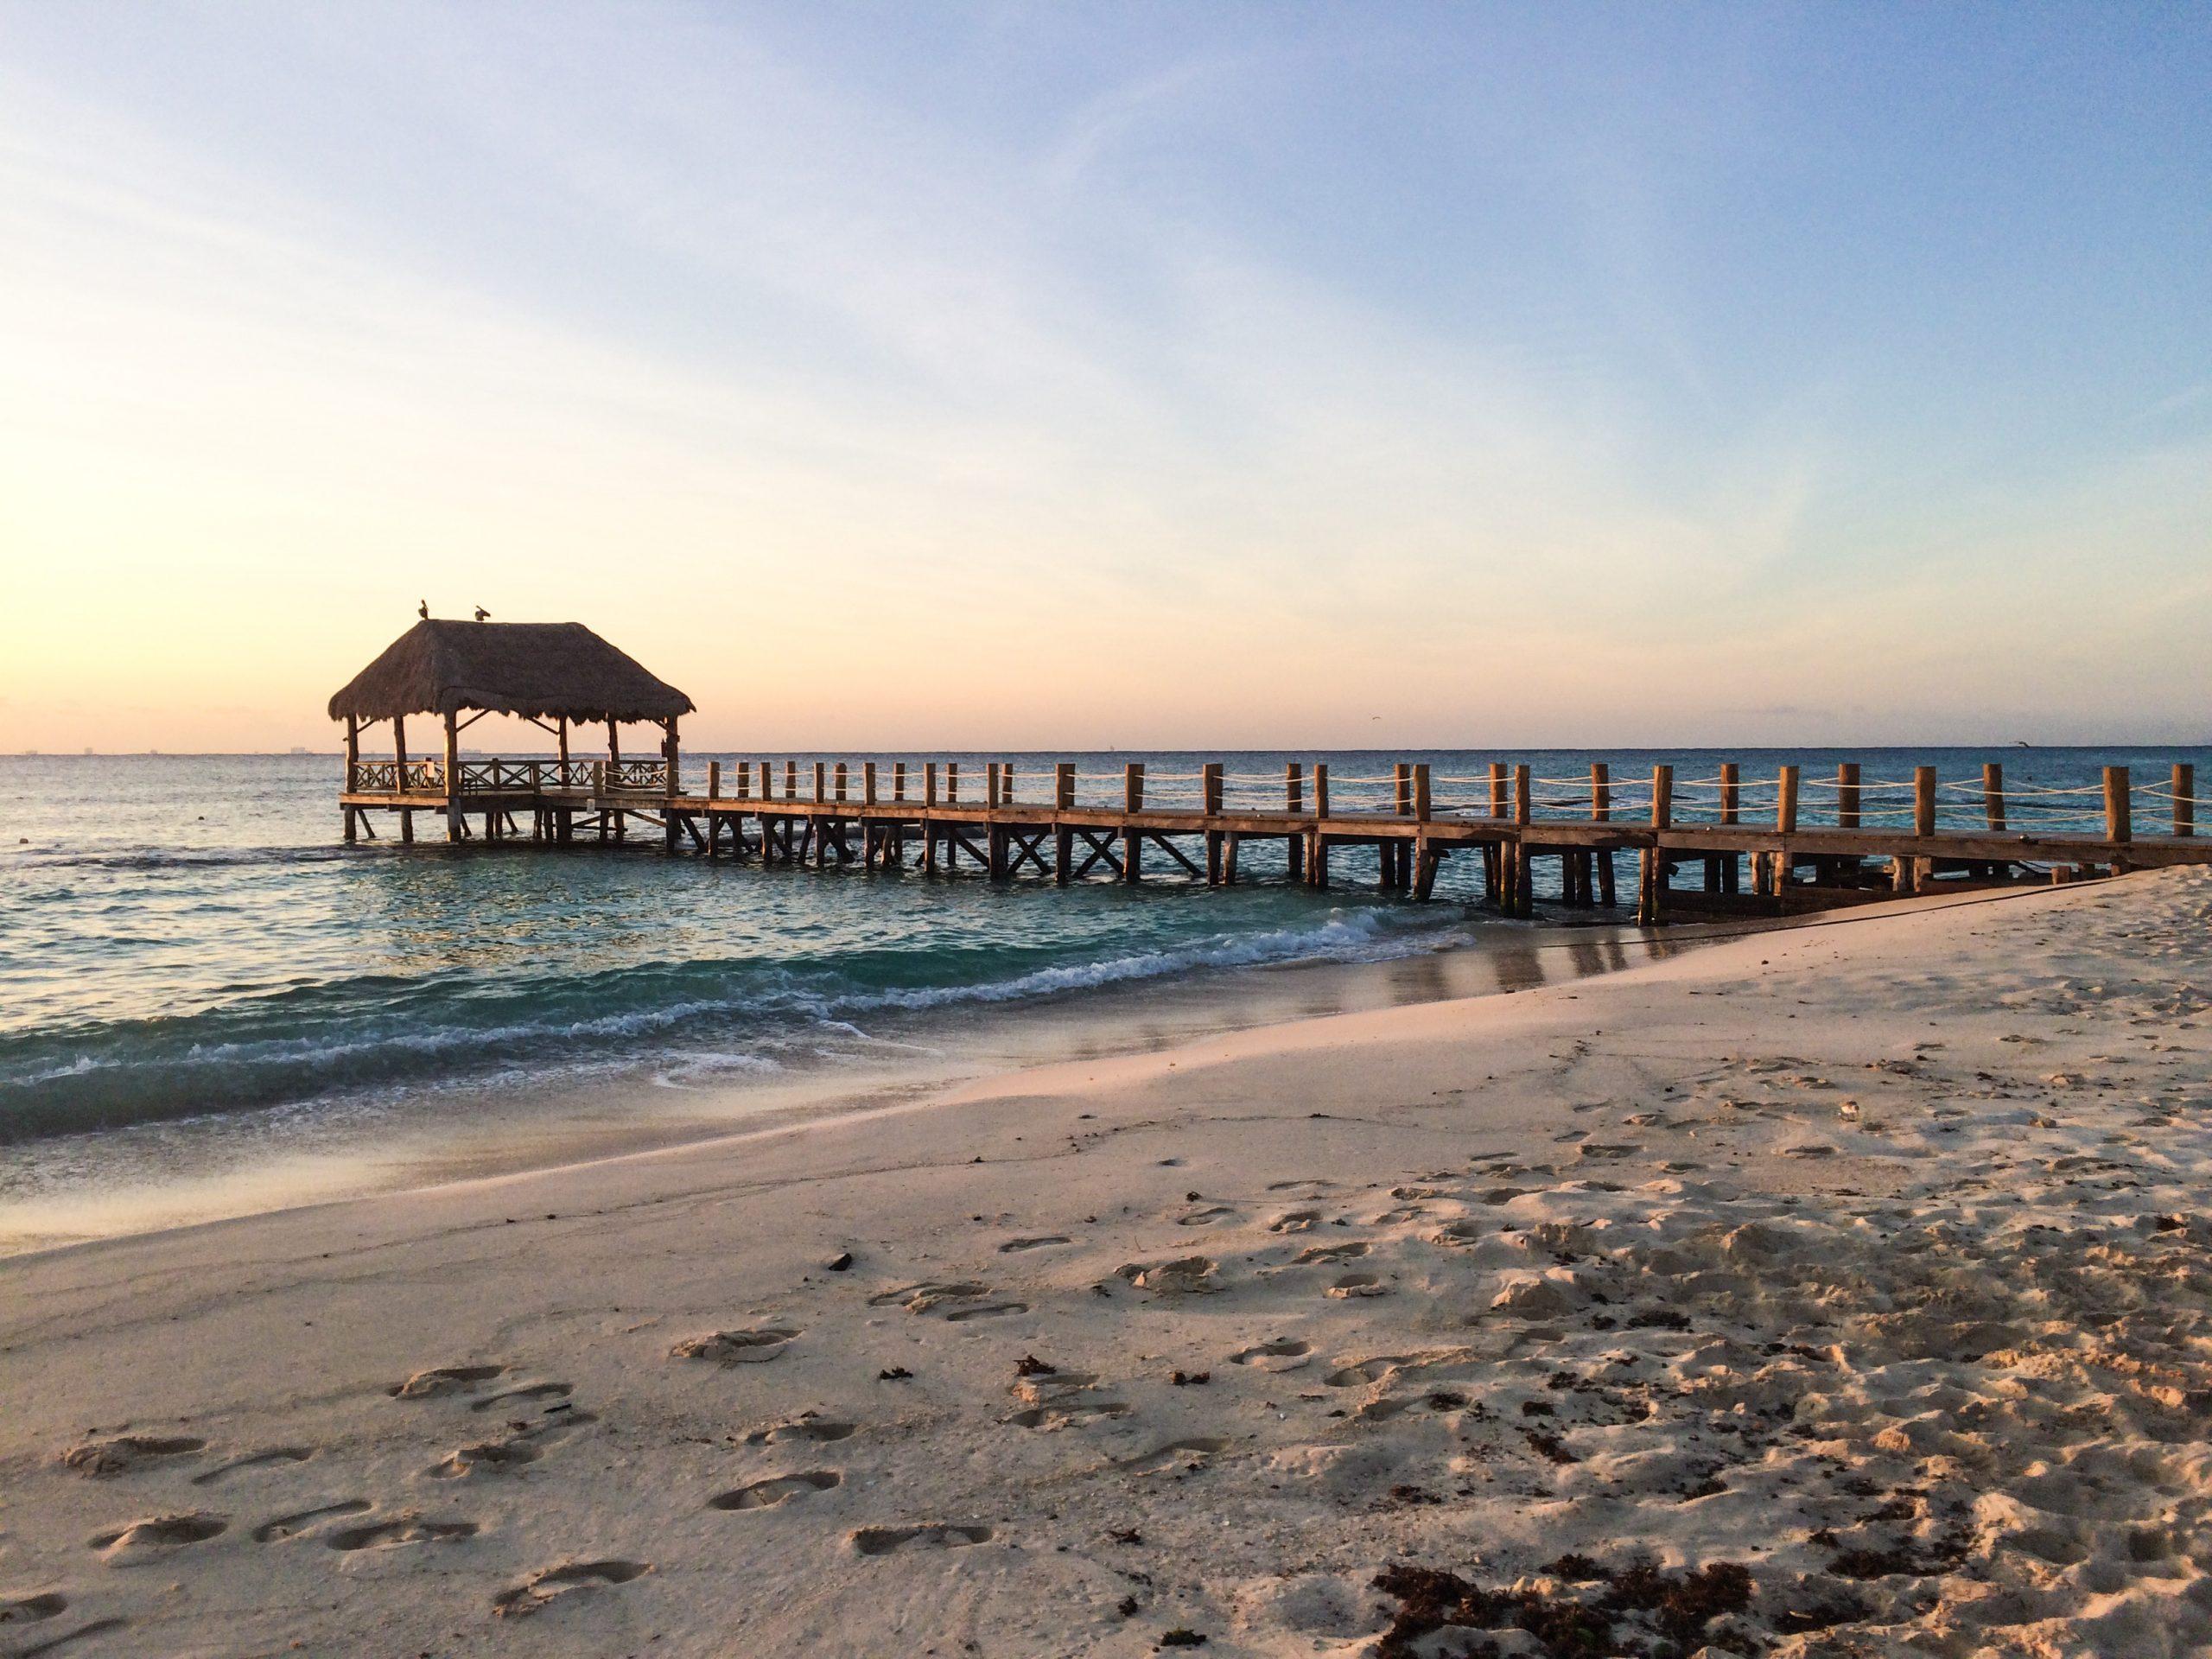 Messico: un viaggio lungo la Riviera Maya